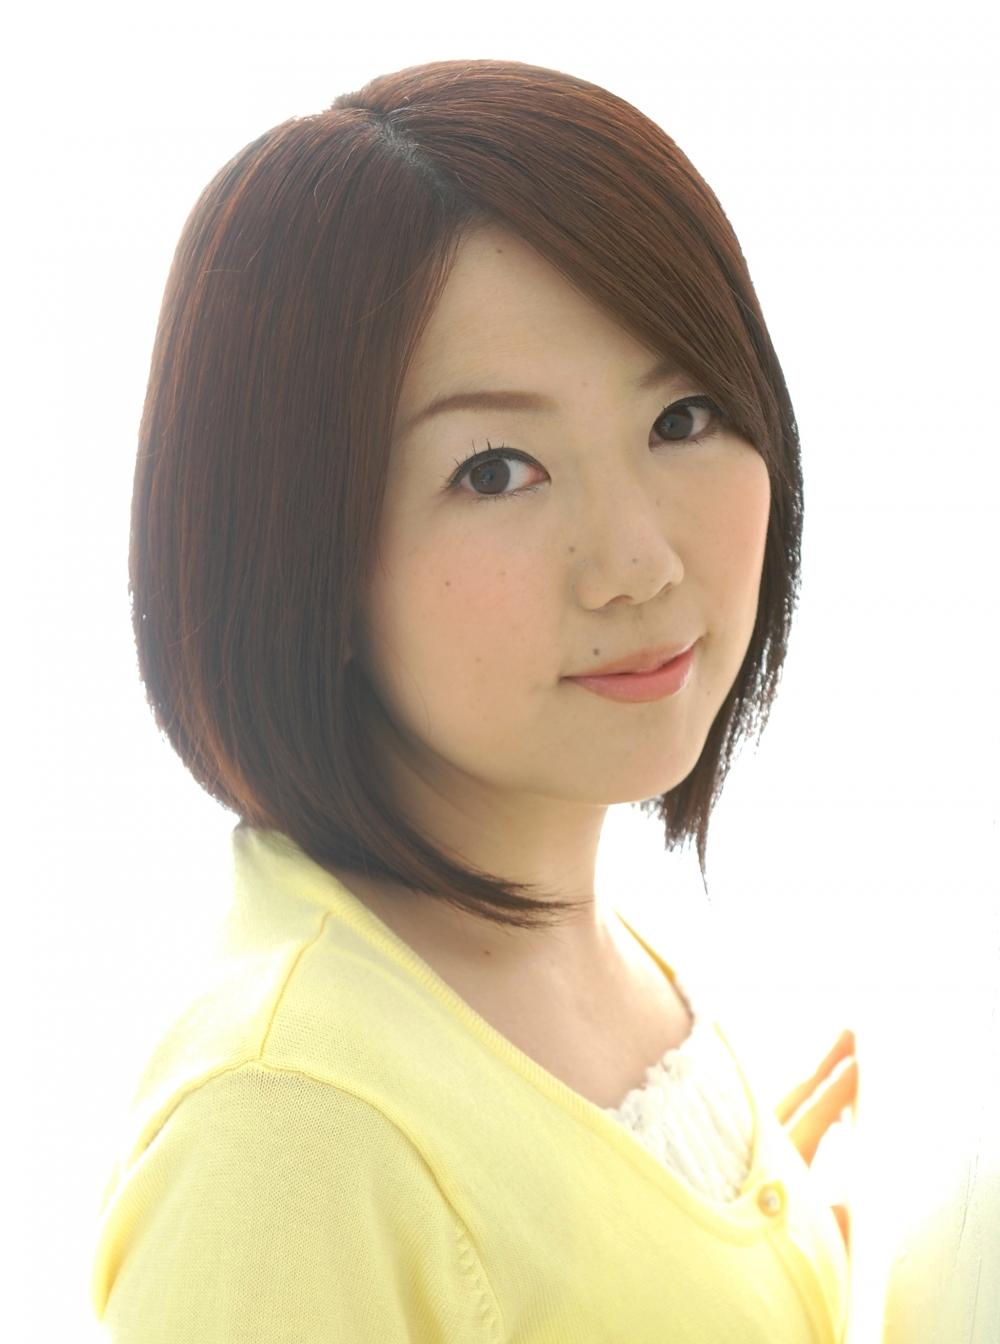 File:HinakoSasaki.jpg